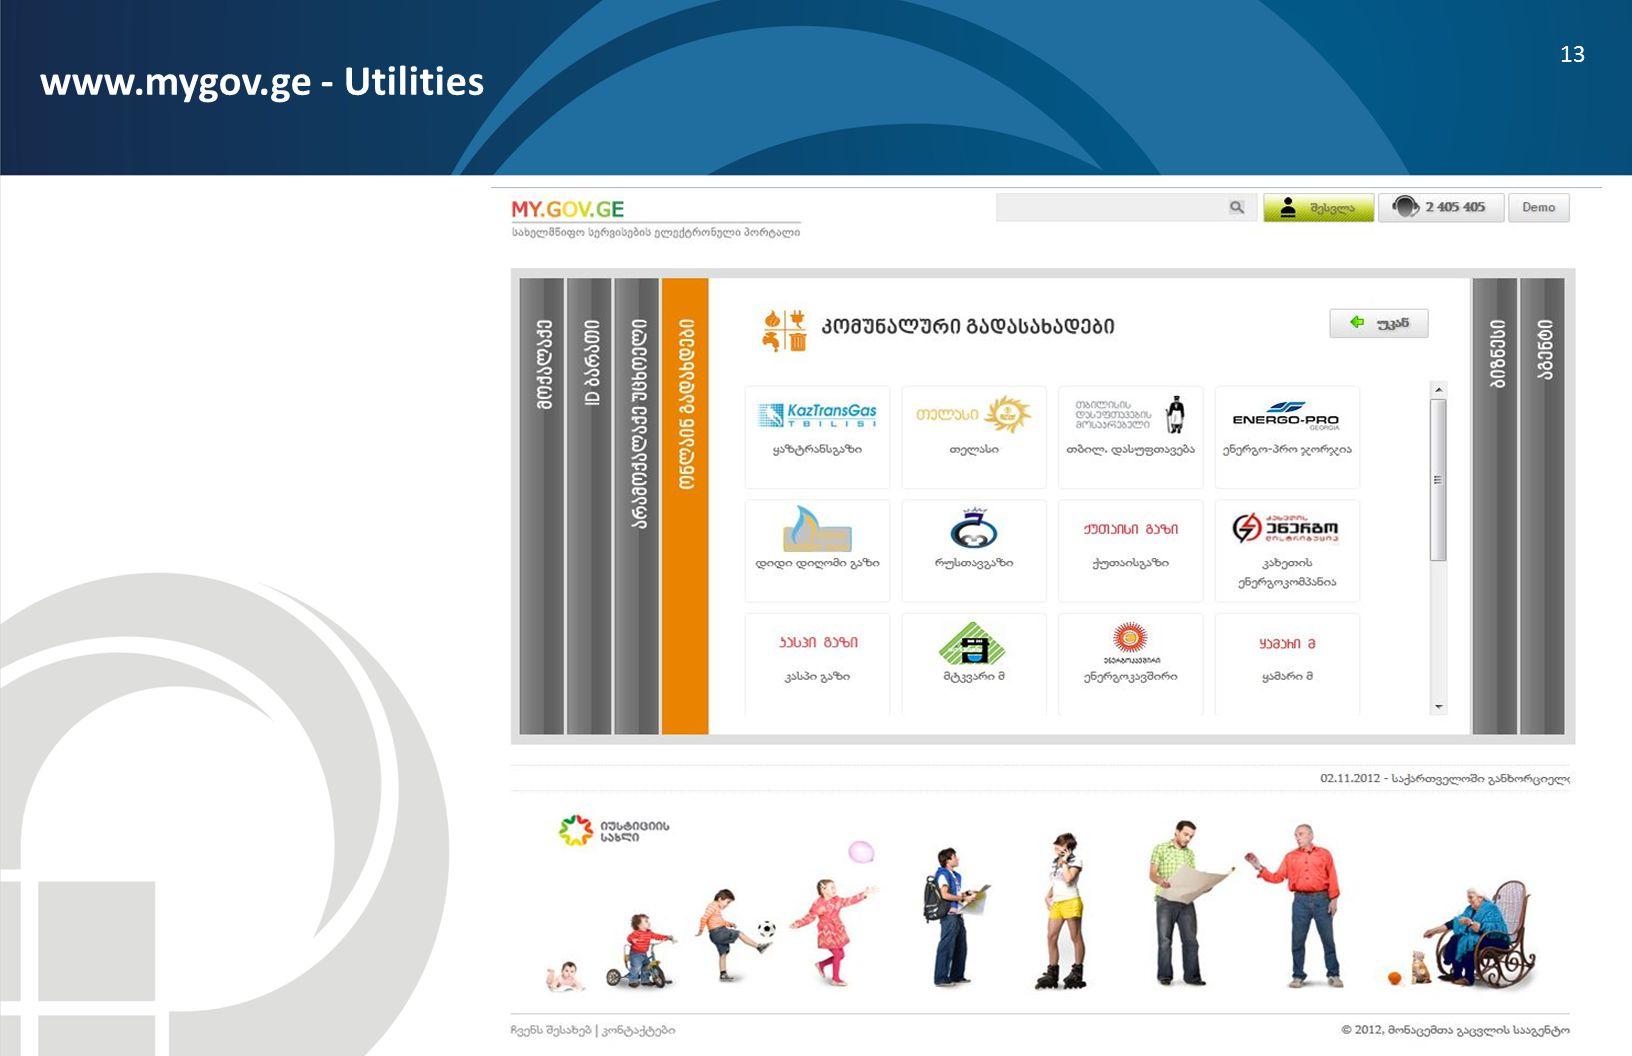 www.mygov.ge - Utilities